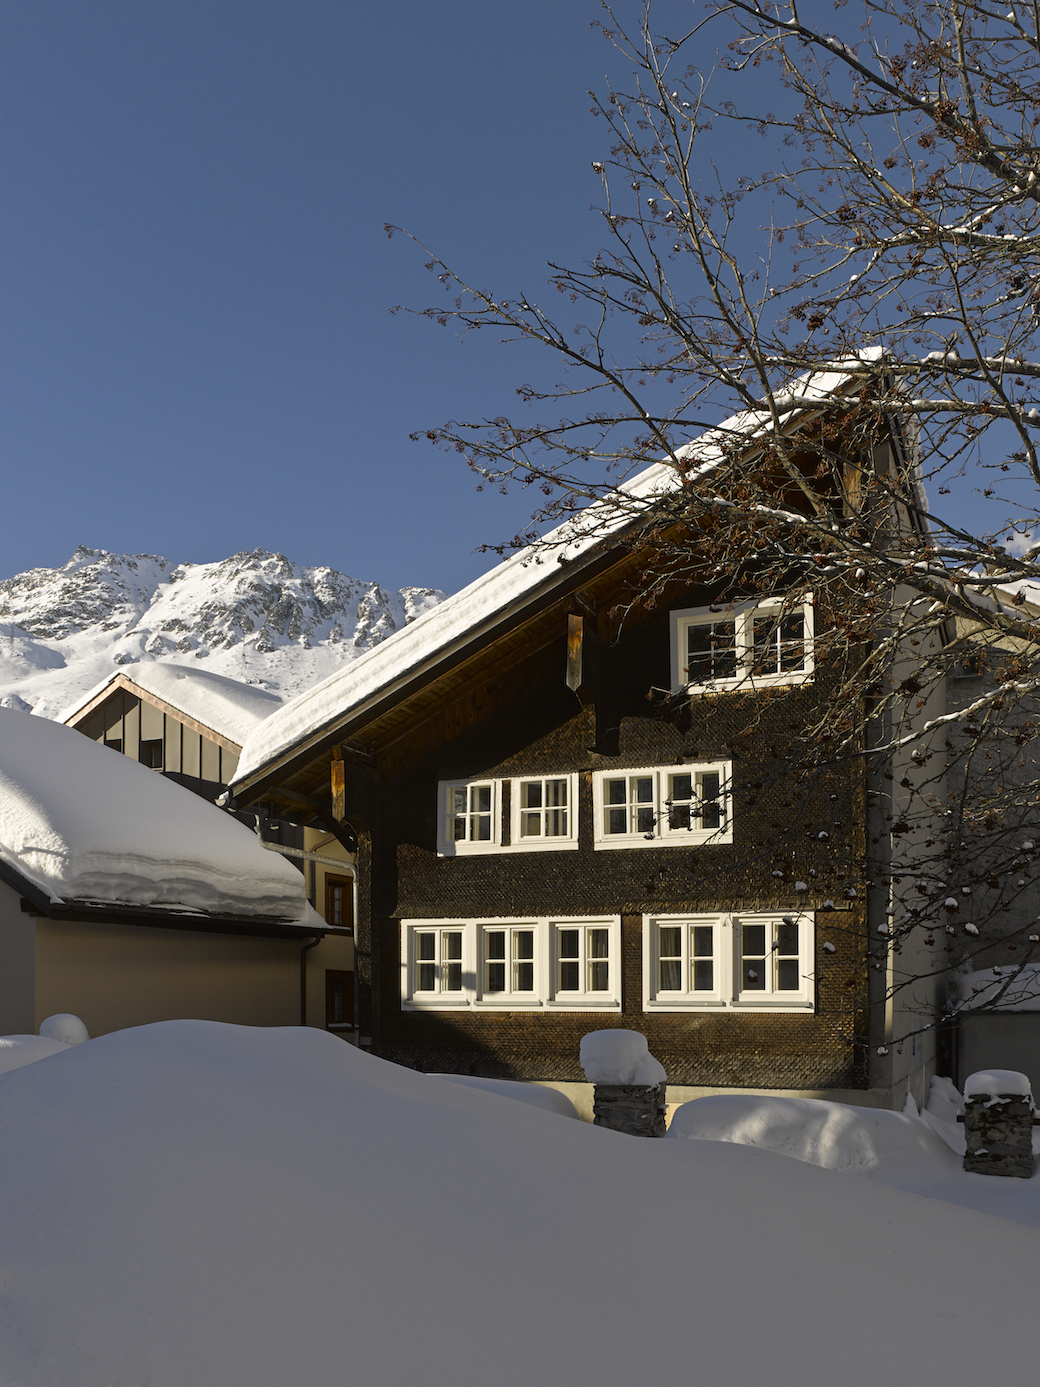 Alpine Chalet, Andermatt, Switzerland, available through The Modern House.